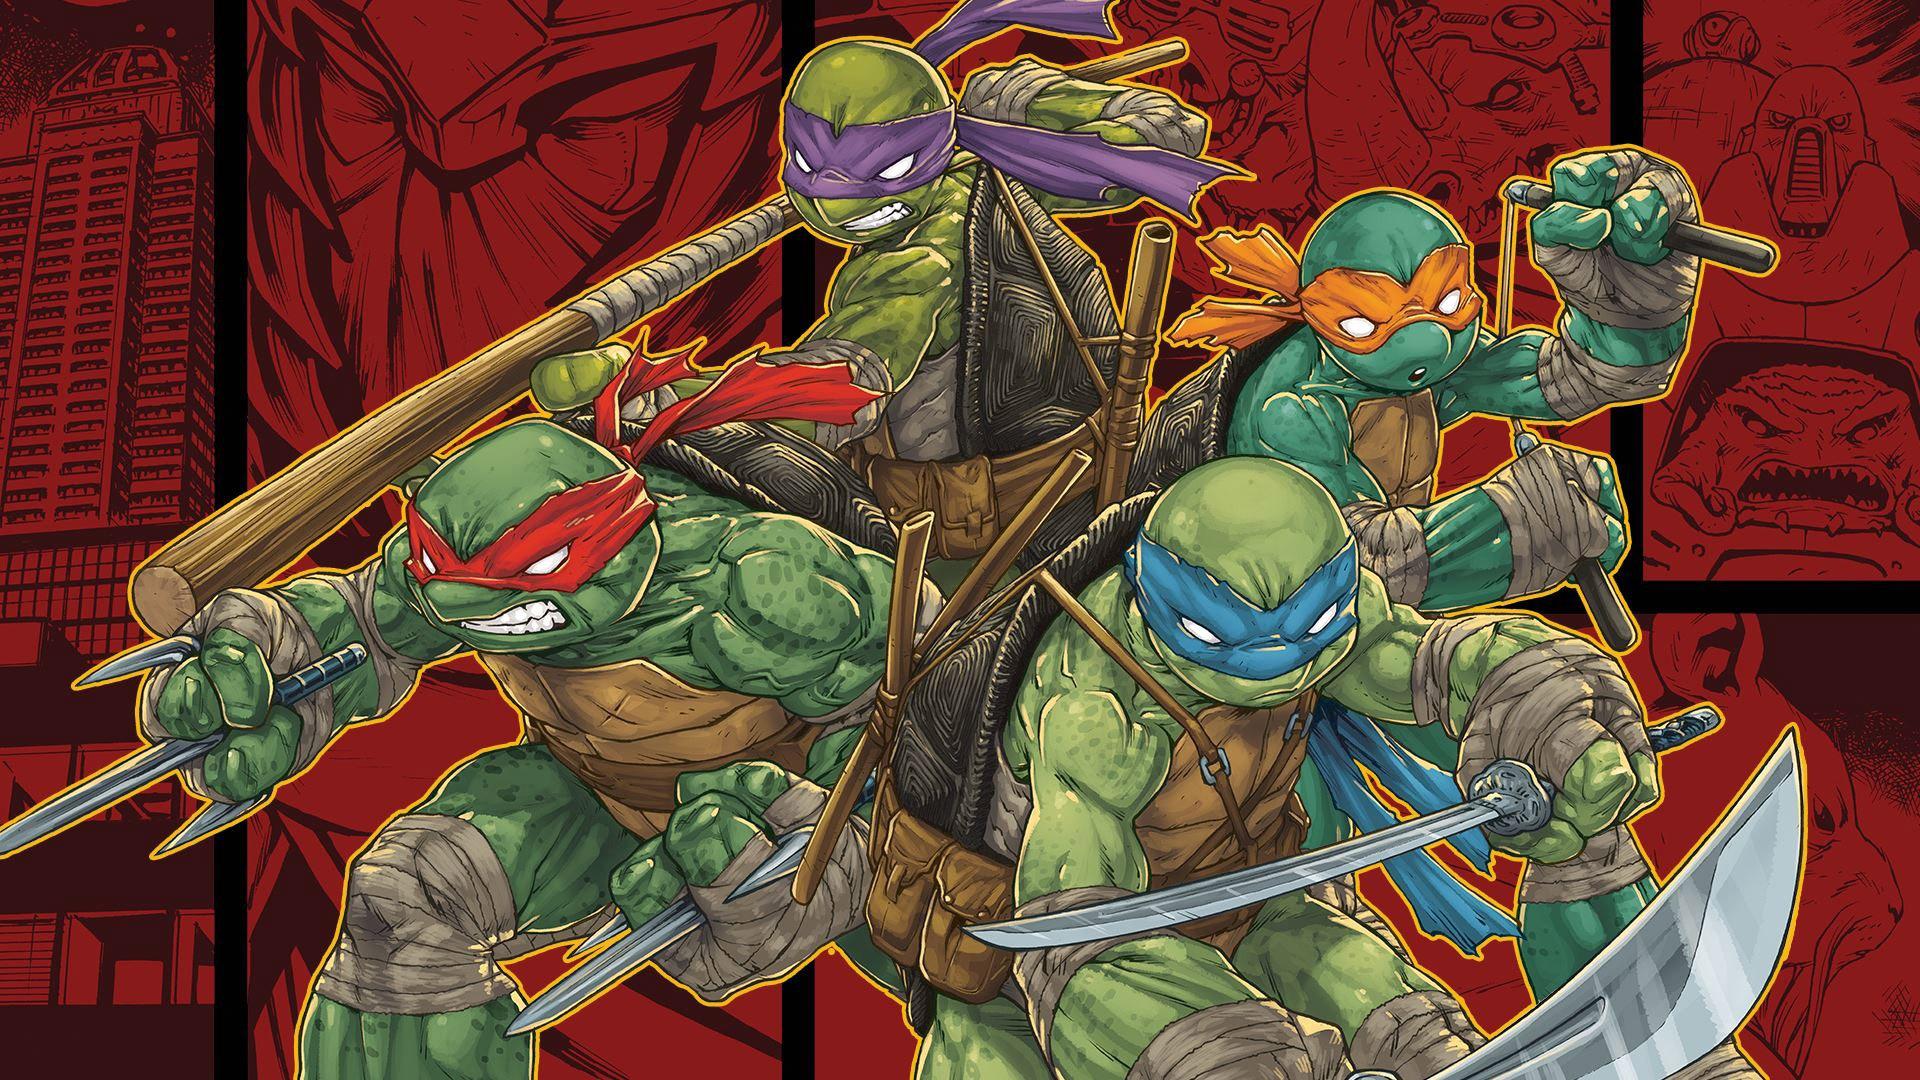 Teenage Mutant Ninja Turtles: Mutants in Manhattan Wallpaper in 1920x1080